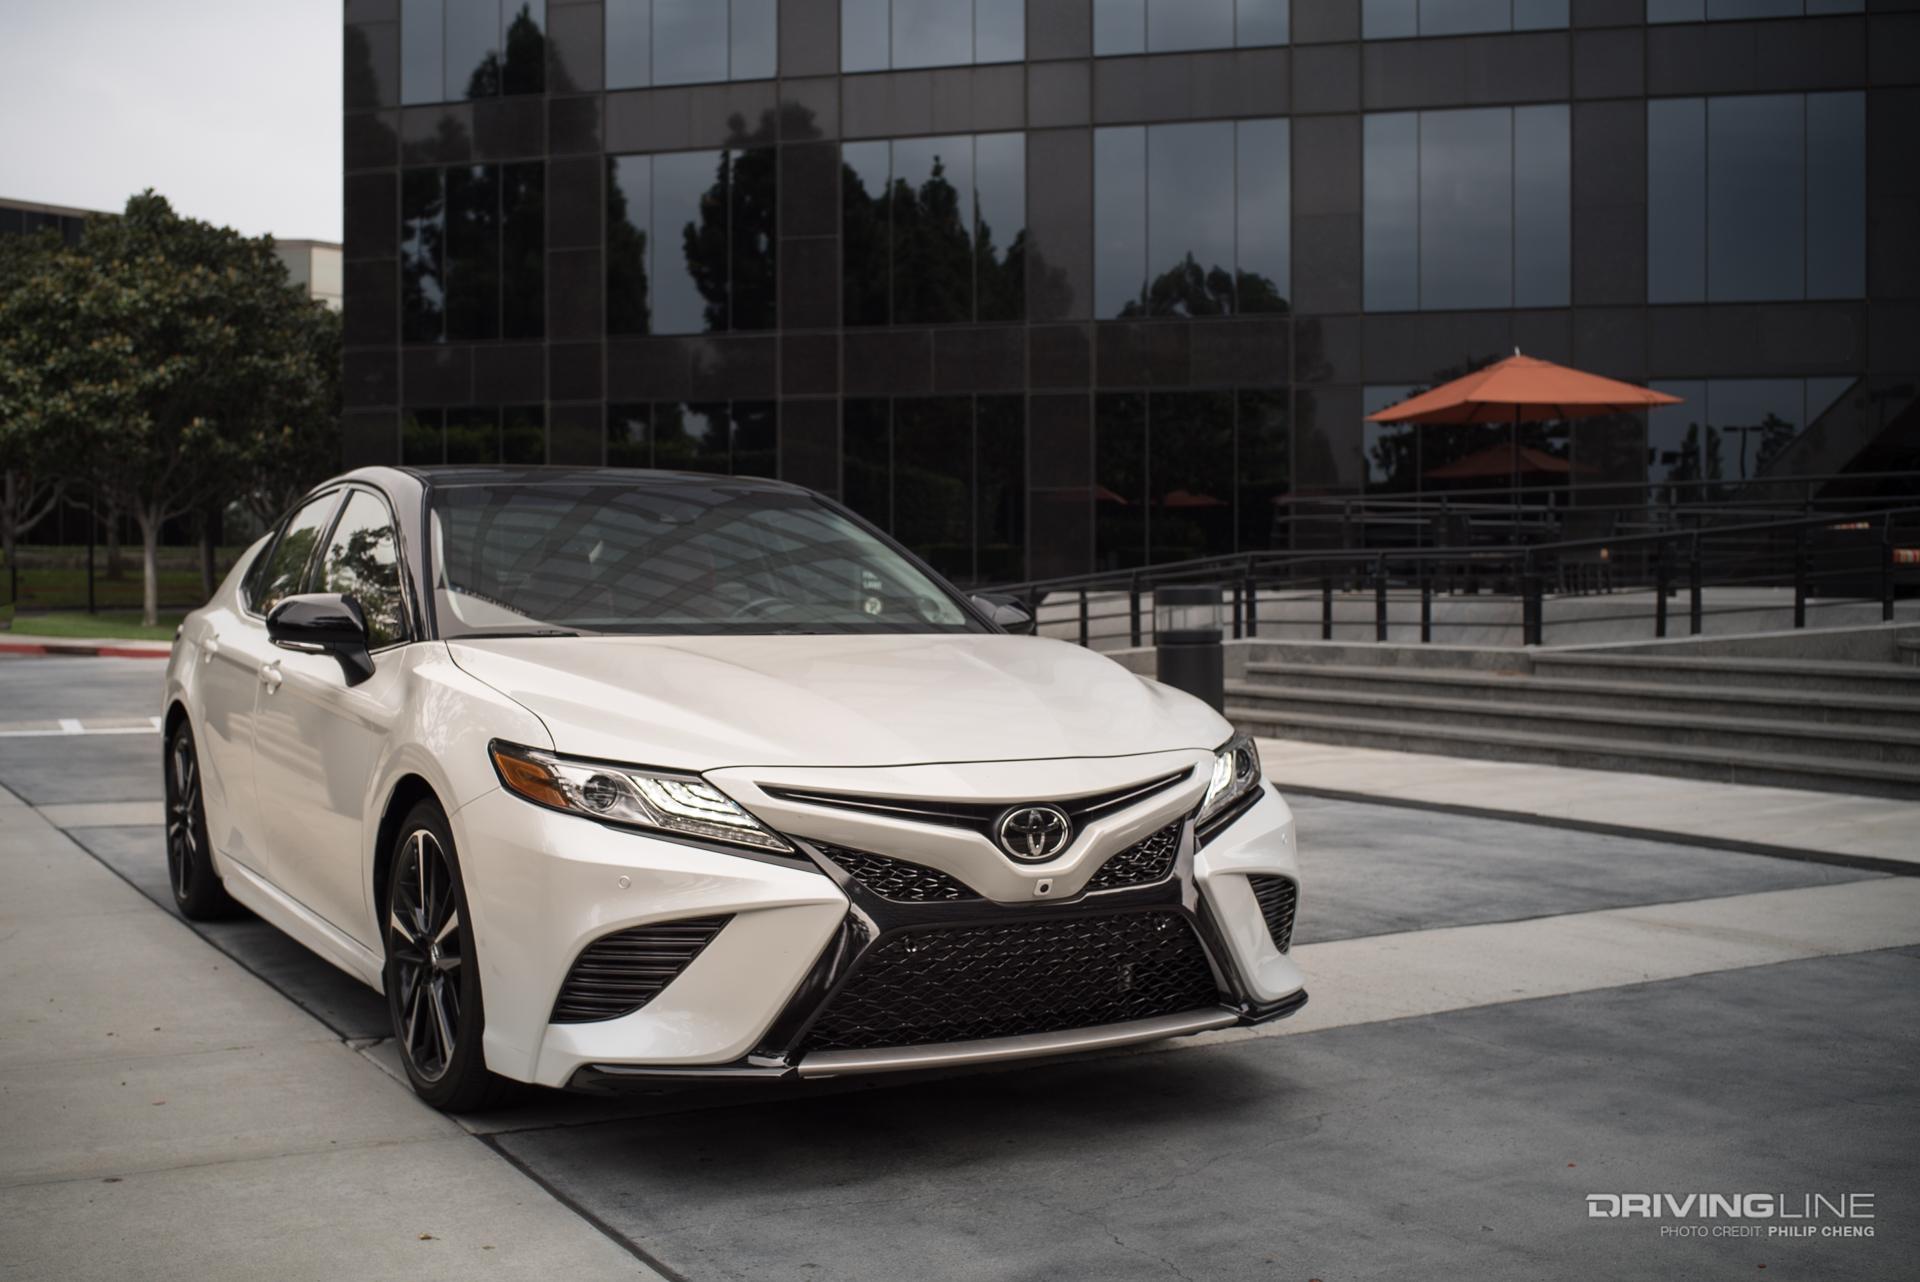 2018 Camry Xse Test Drive Making Toyota Fun Again